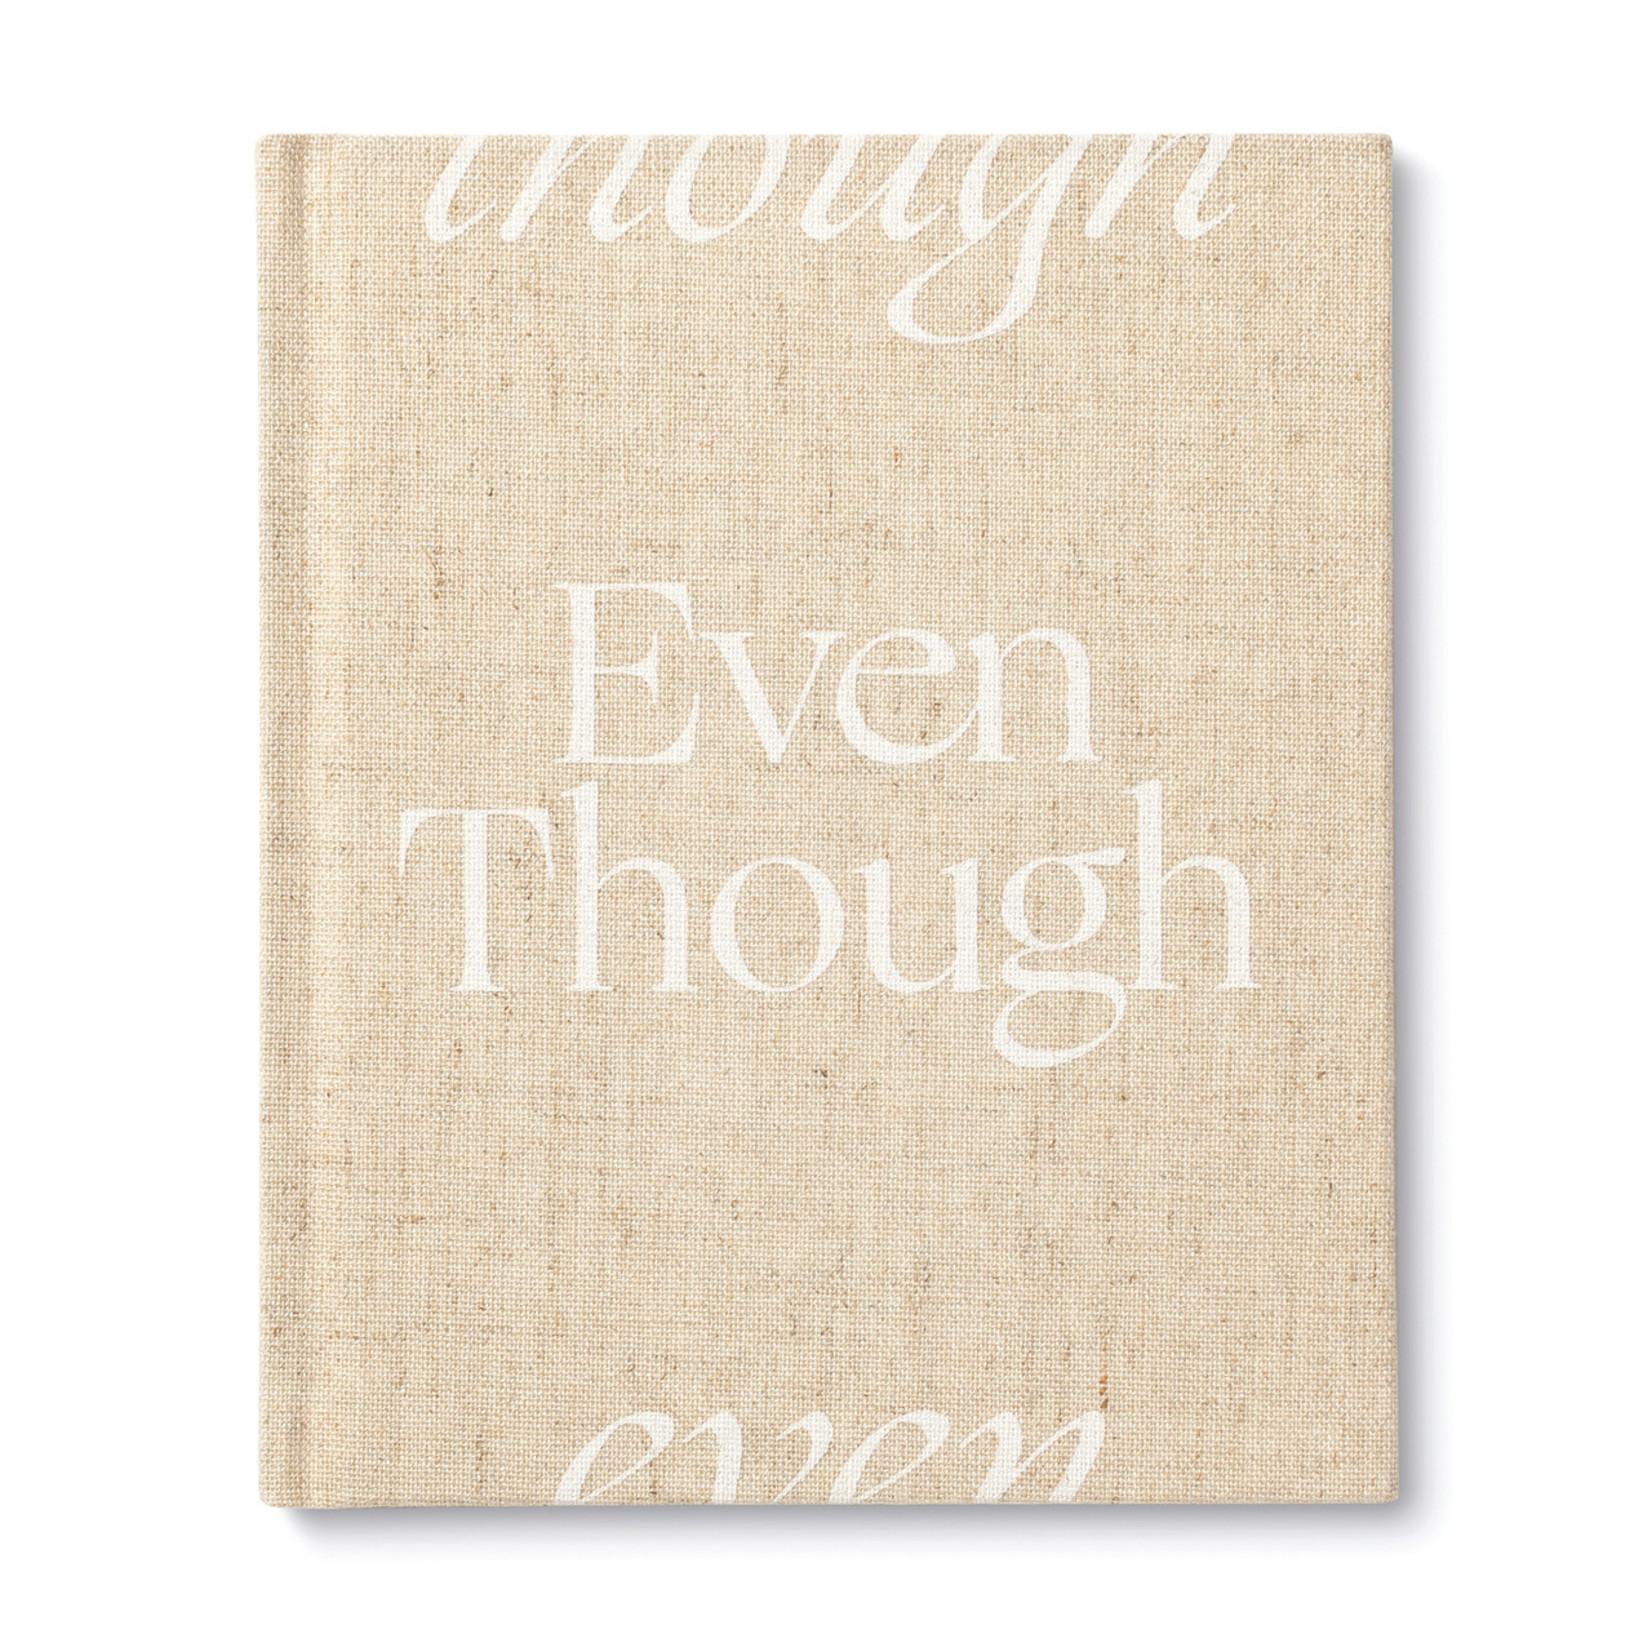 Compendium Book - Even Though